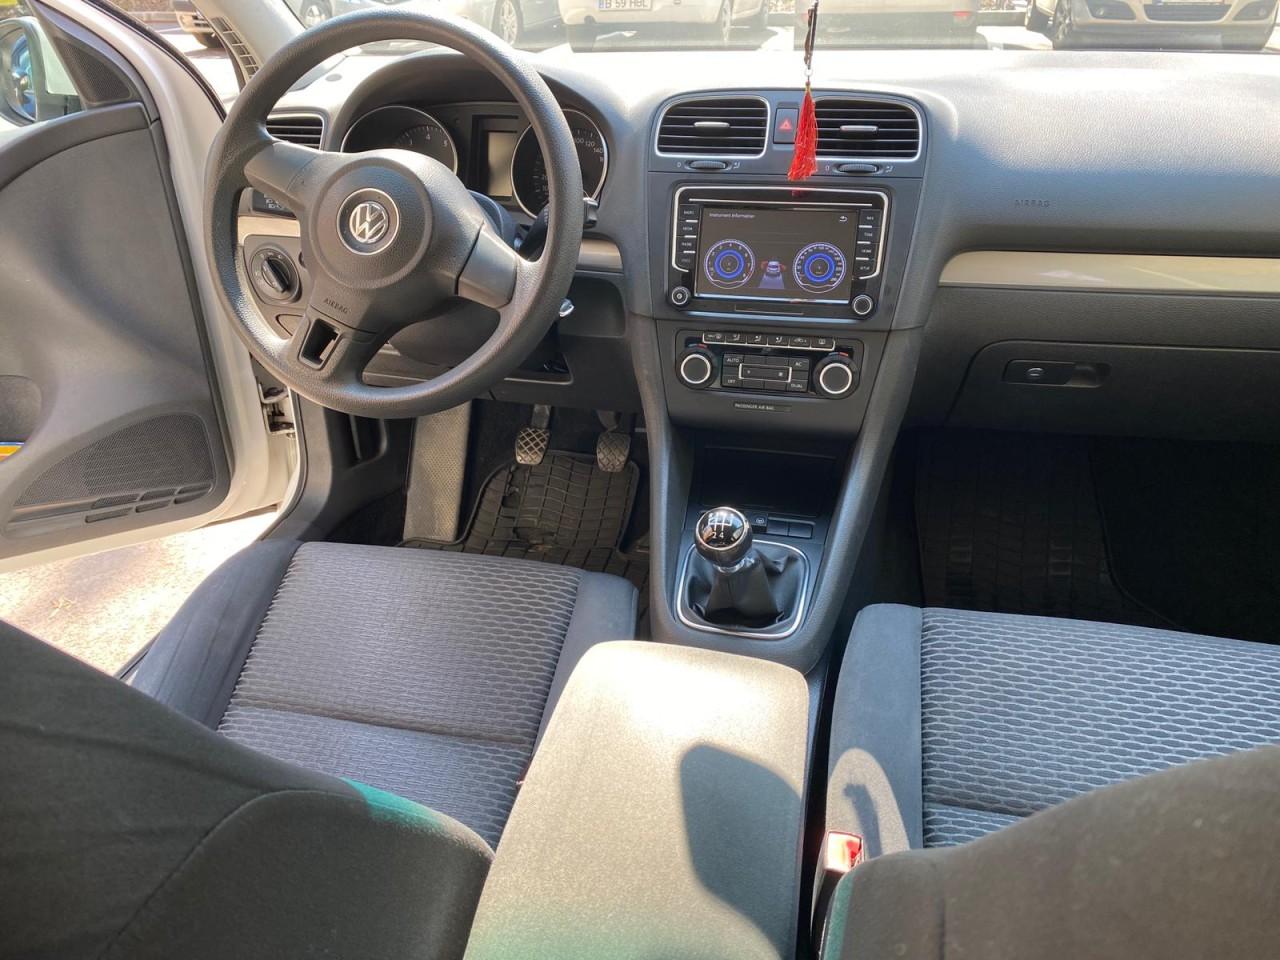 VW Golf 1.4 MPi 2010